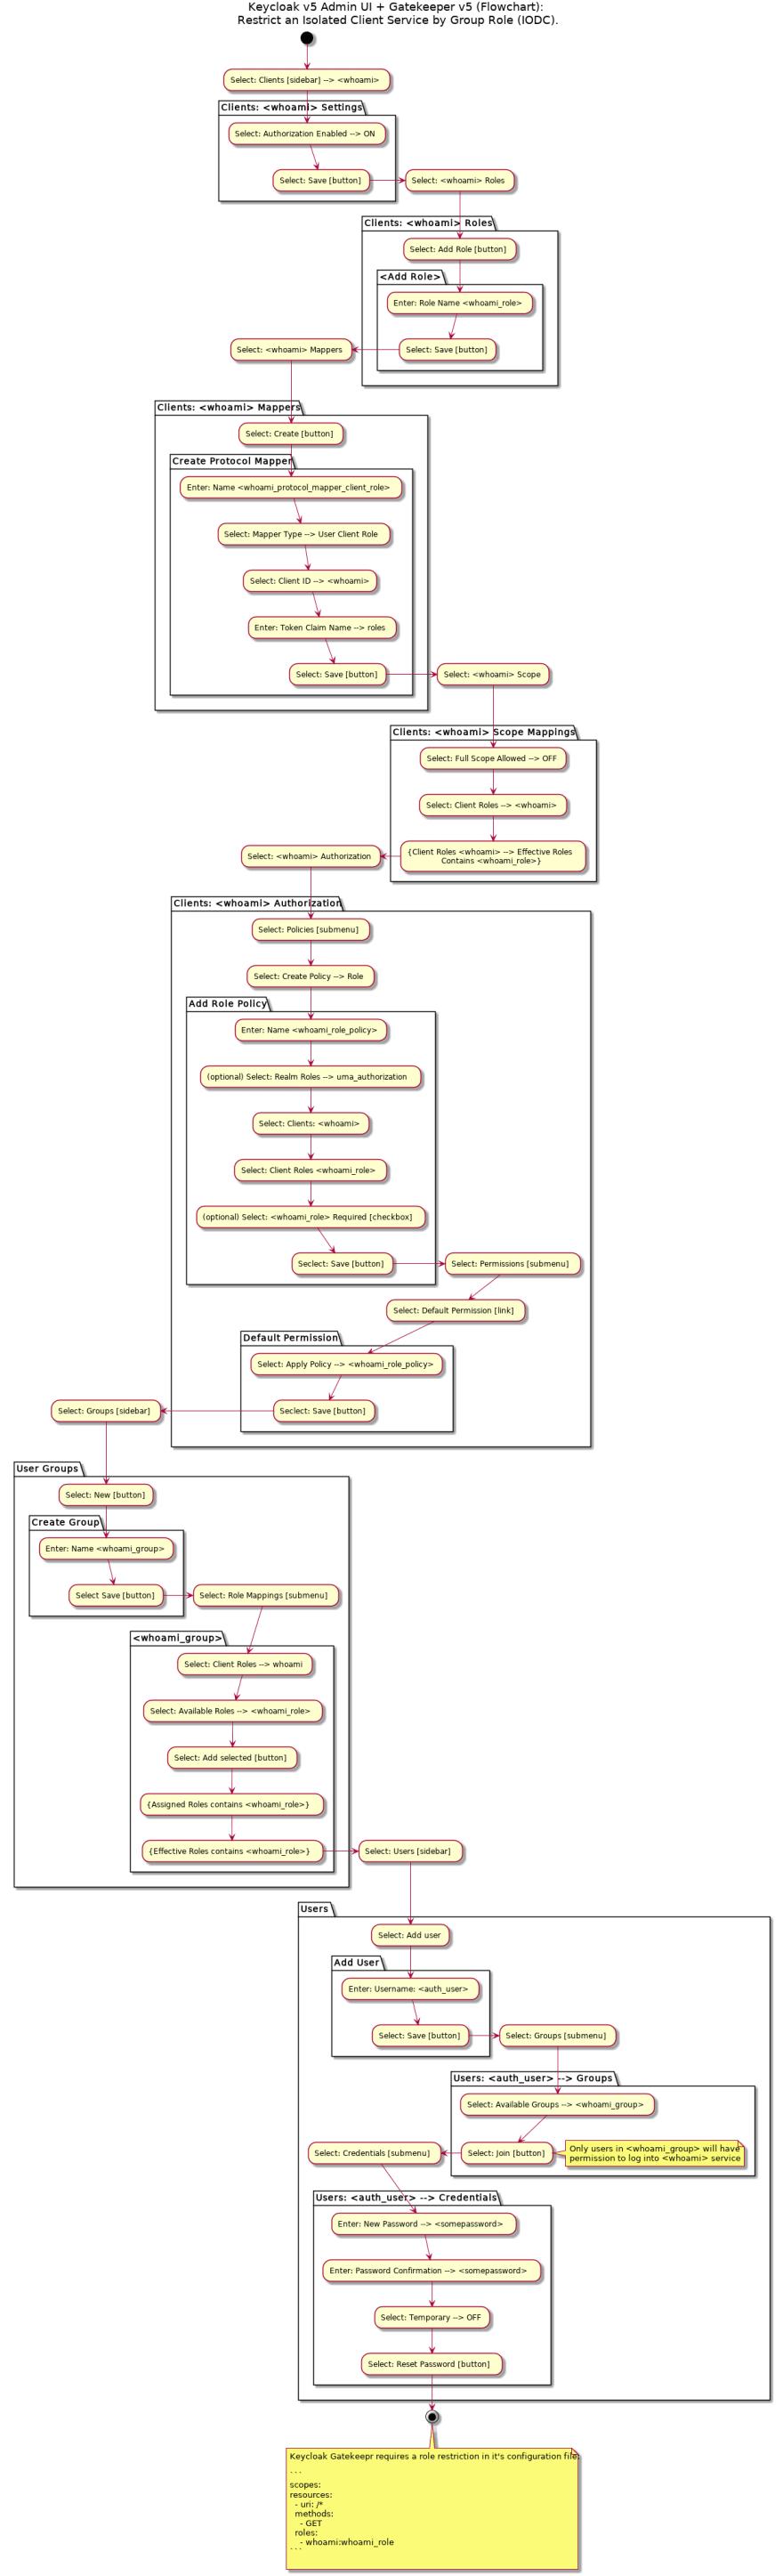 keycloak-gatekeeper-group-auth.png